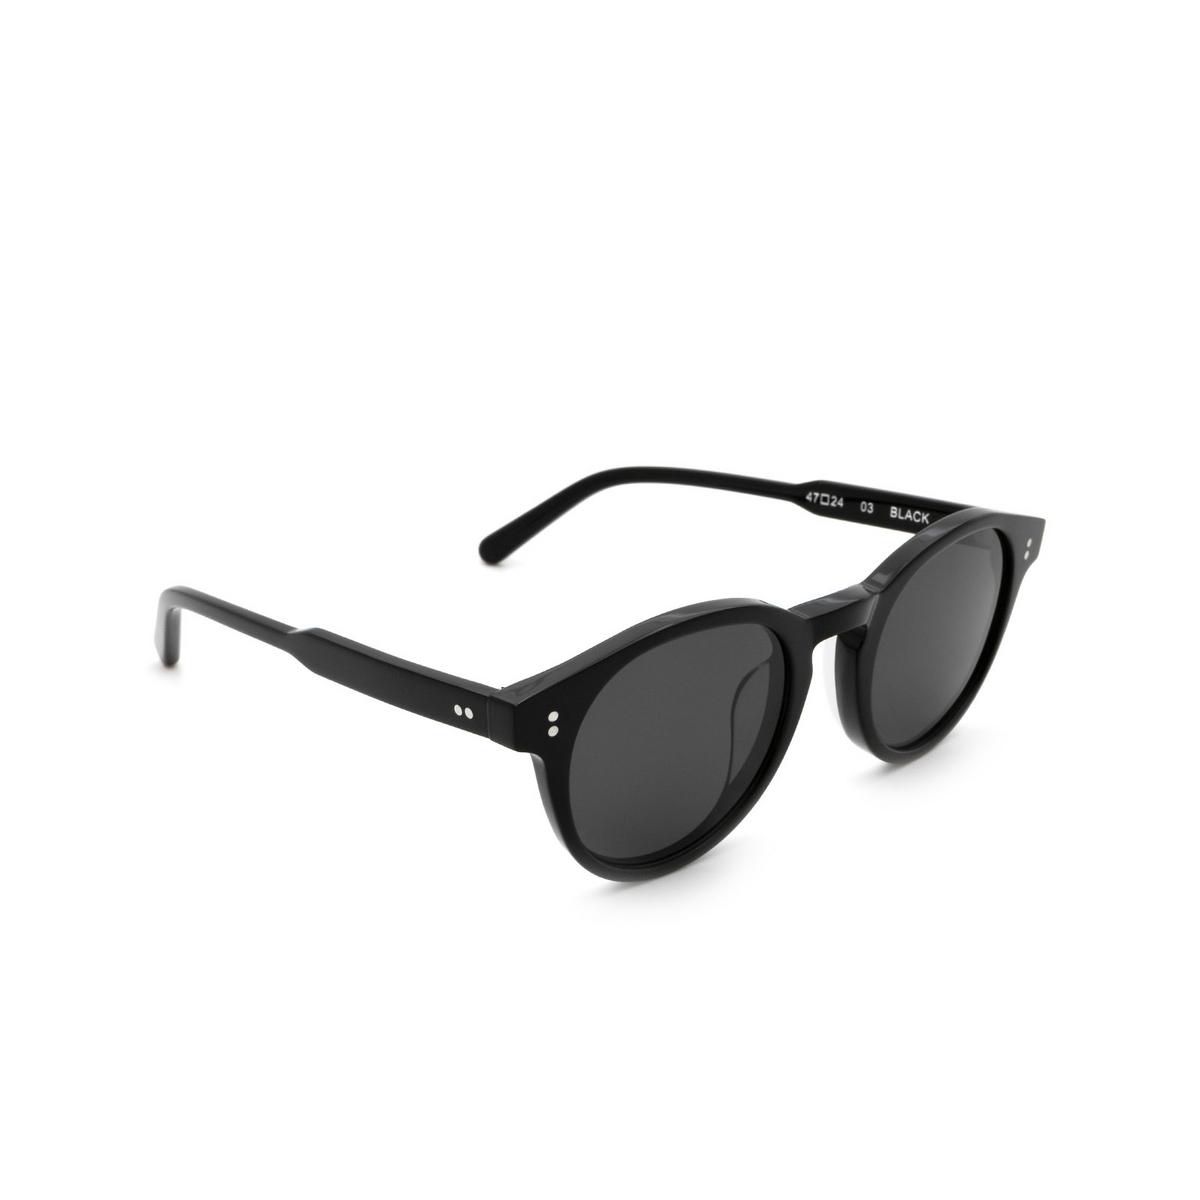 Chimi® Round Sunglasses: 03 color Black - three-quarters view.